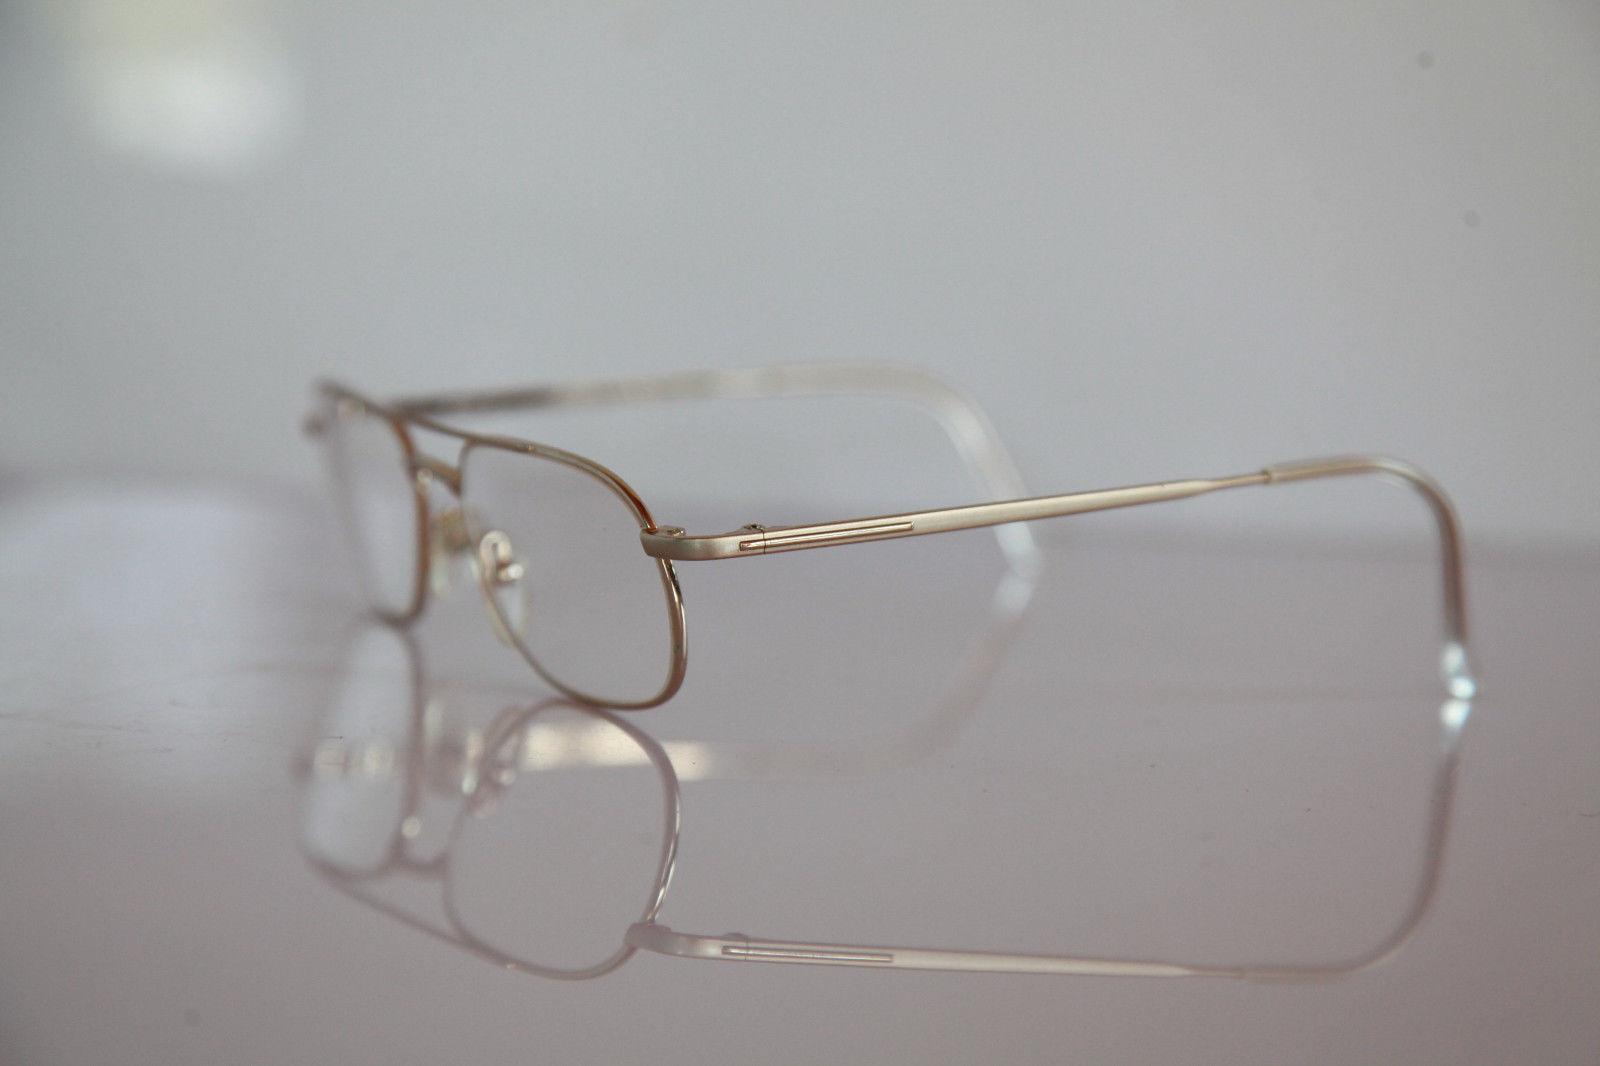 FIELMANN Eyewear, Gold  Frame, RX-Able Prescription lenses.